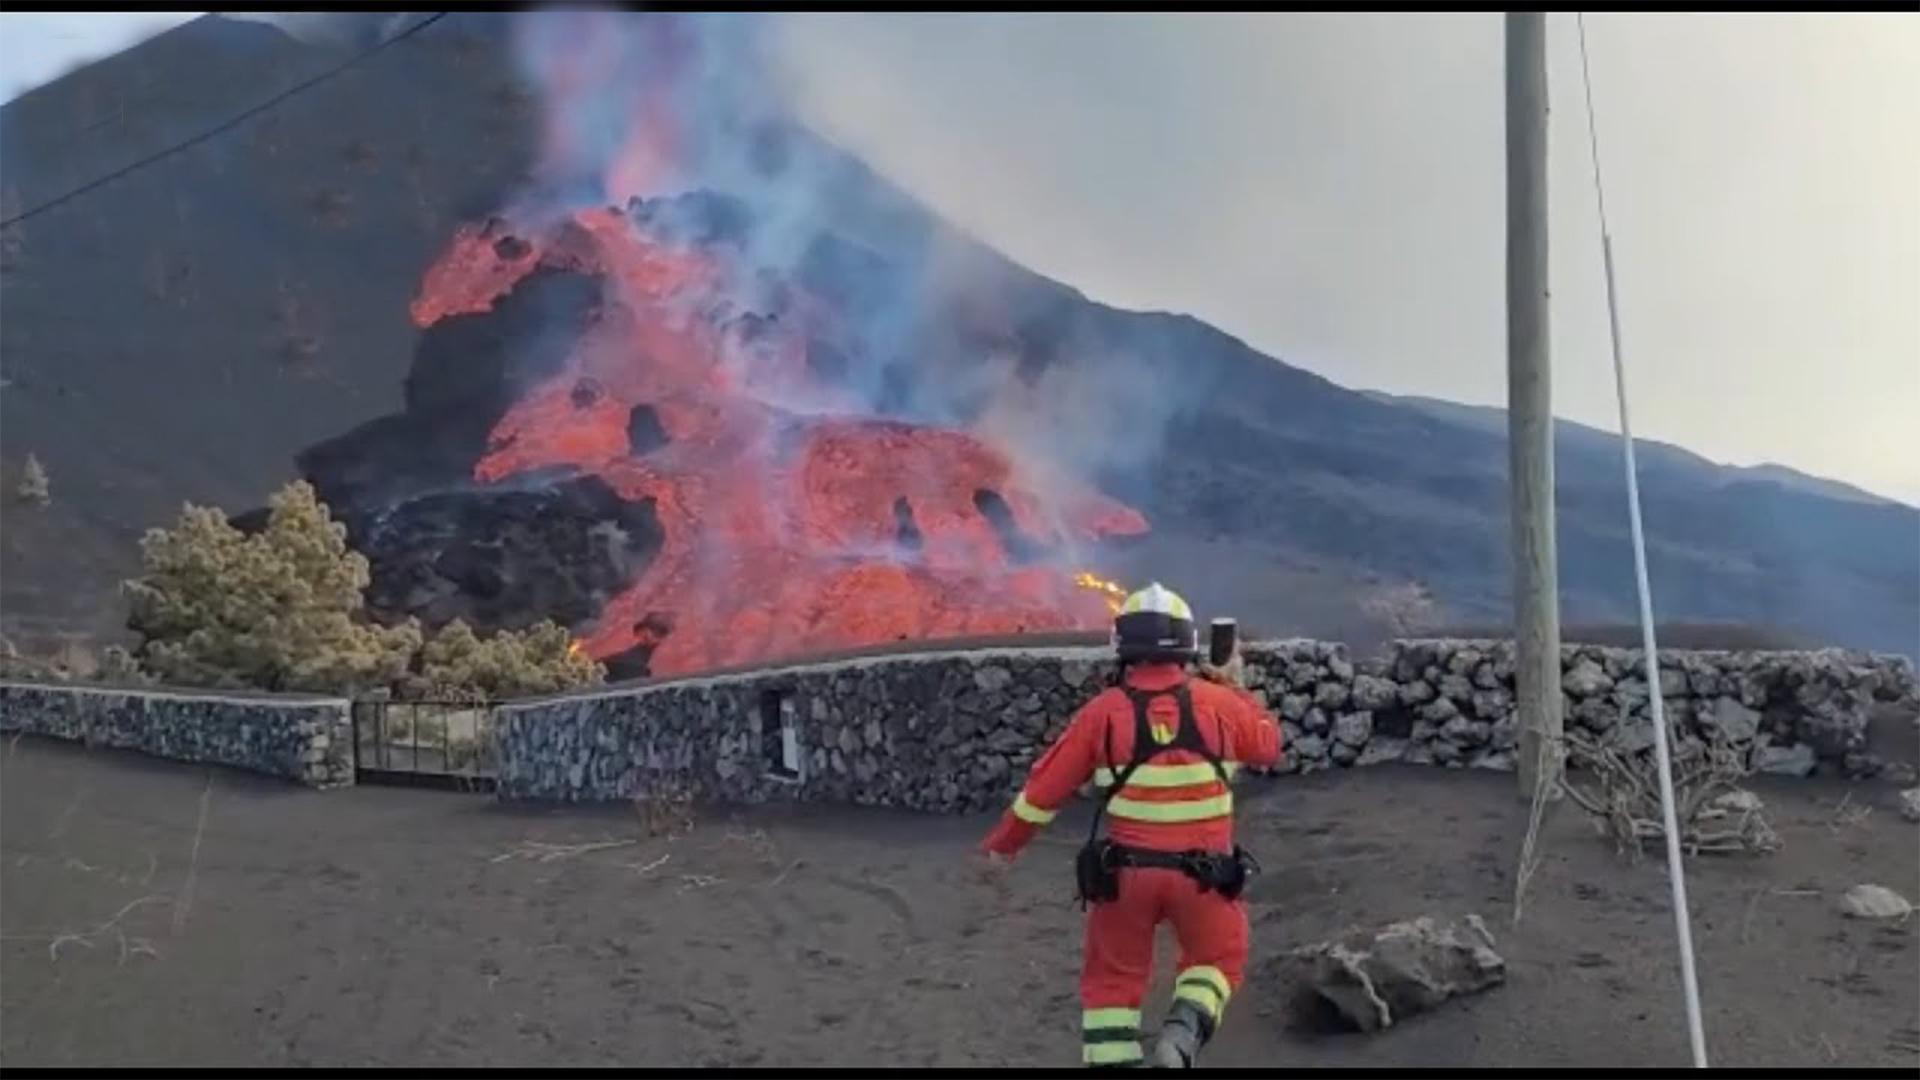 Vulkanausbruch: Videos zeigen neuen Lavastrom auf La Palma thumbnail